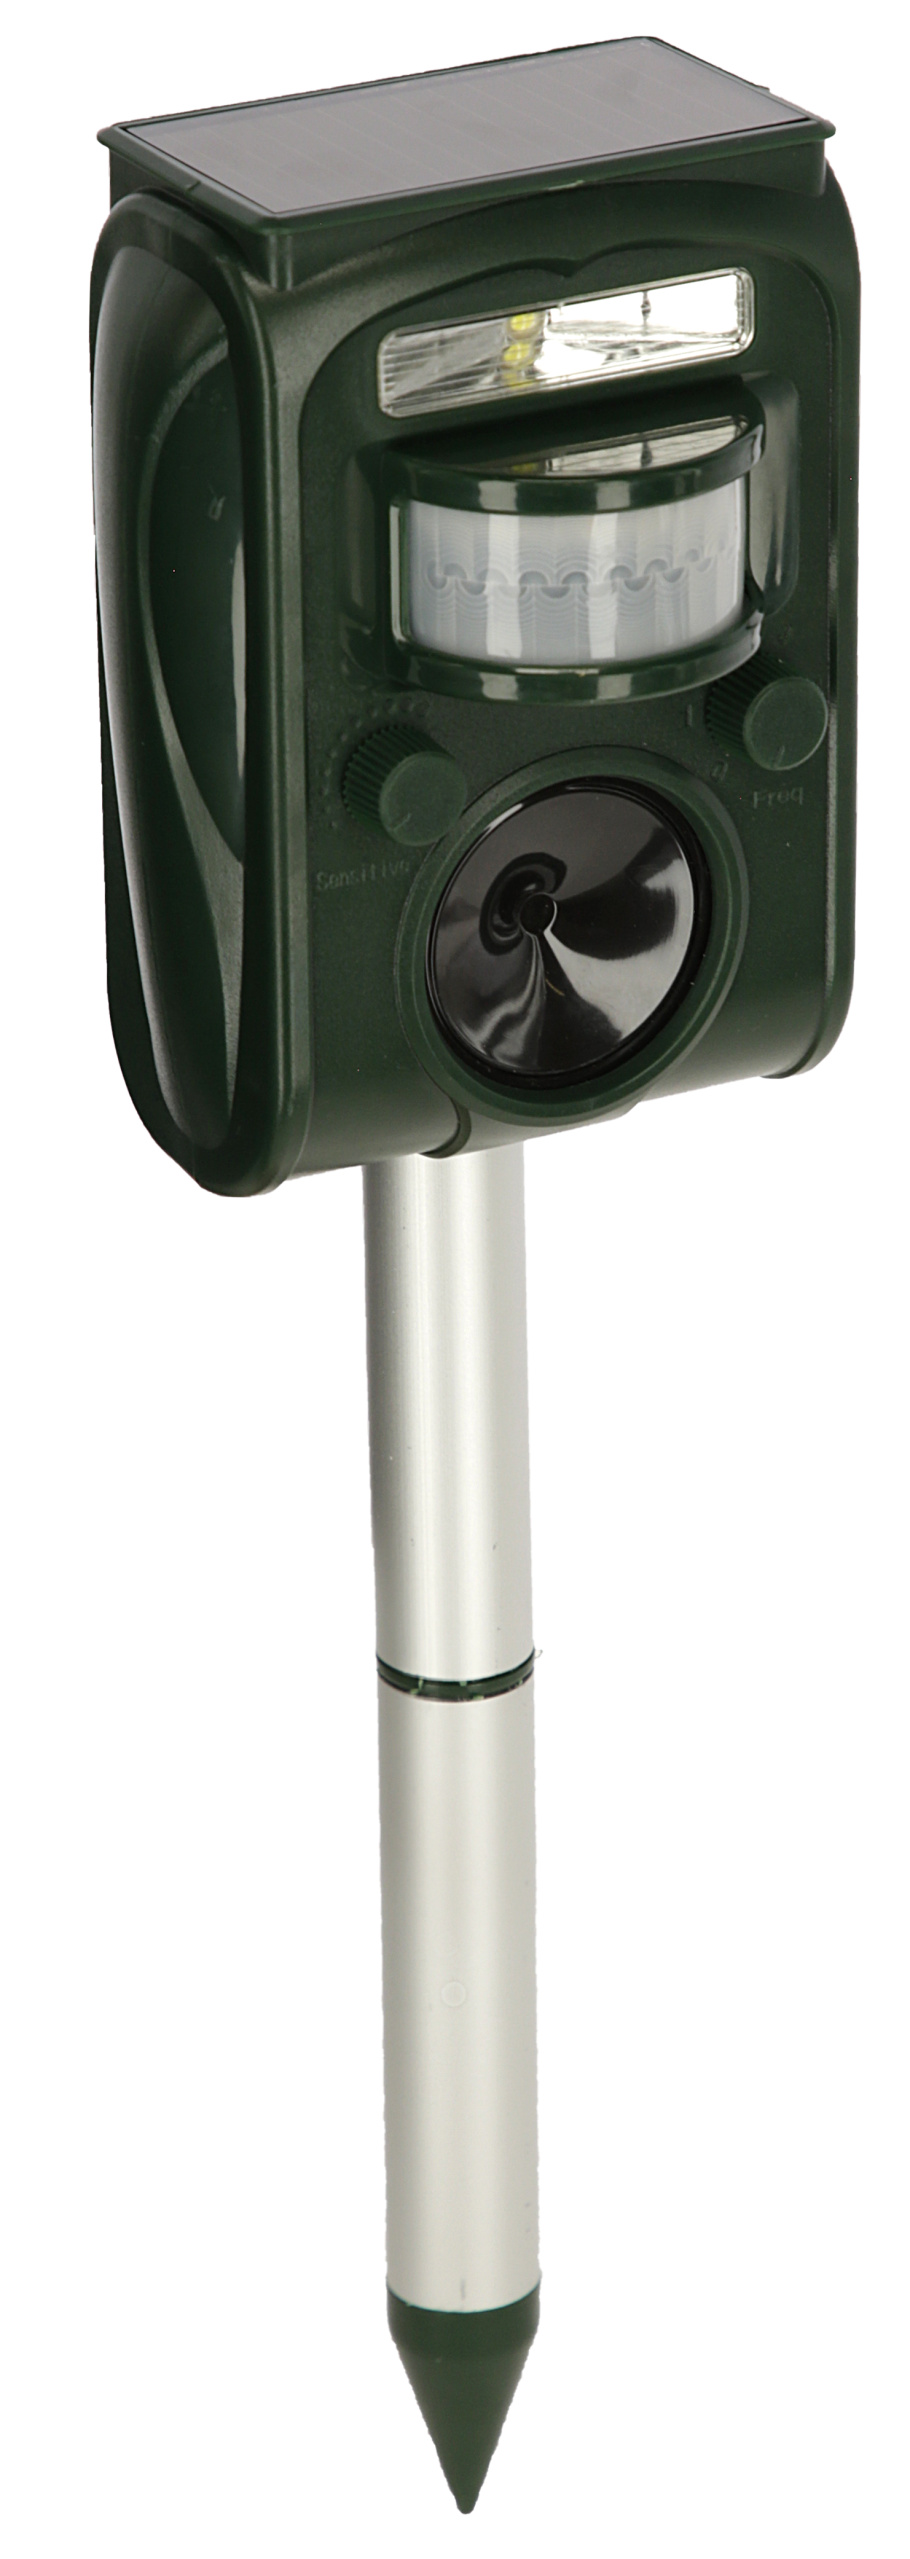 Ultraschall-Tiervertreiber SonicFlash, integr. Solarpanel